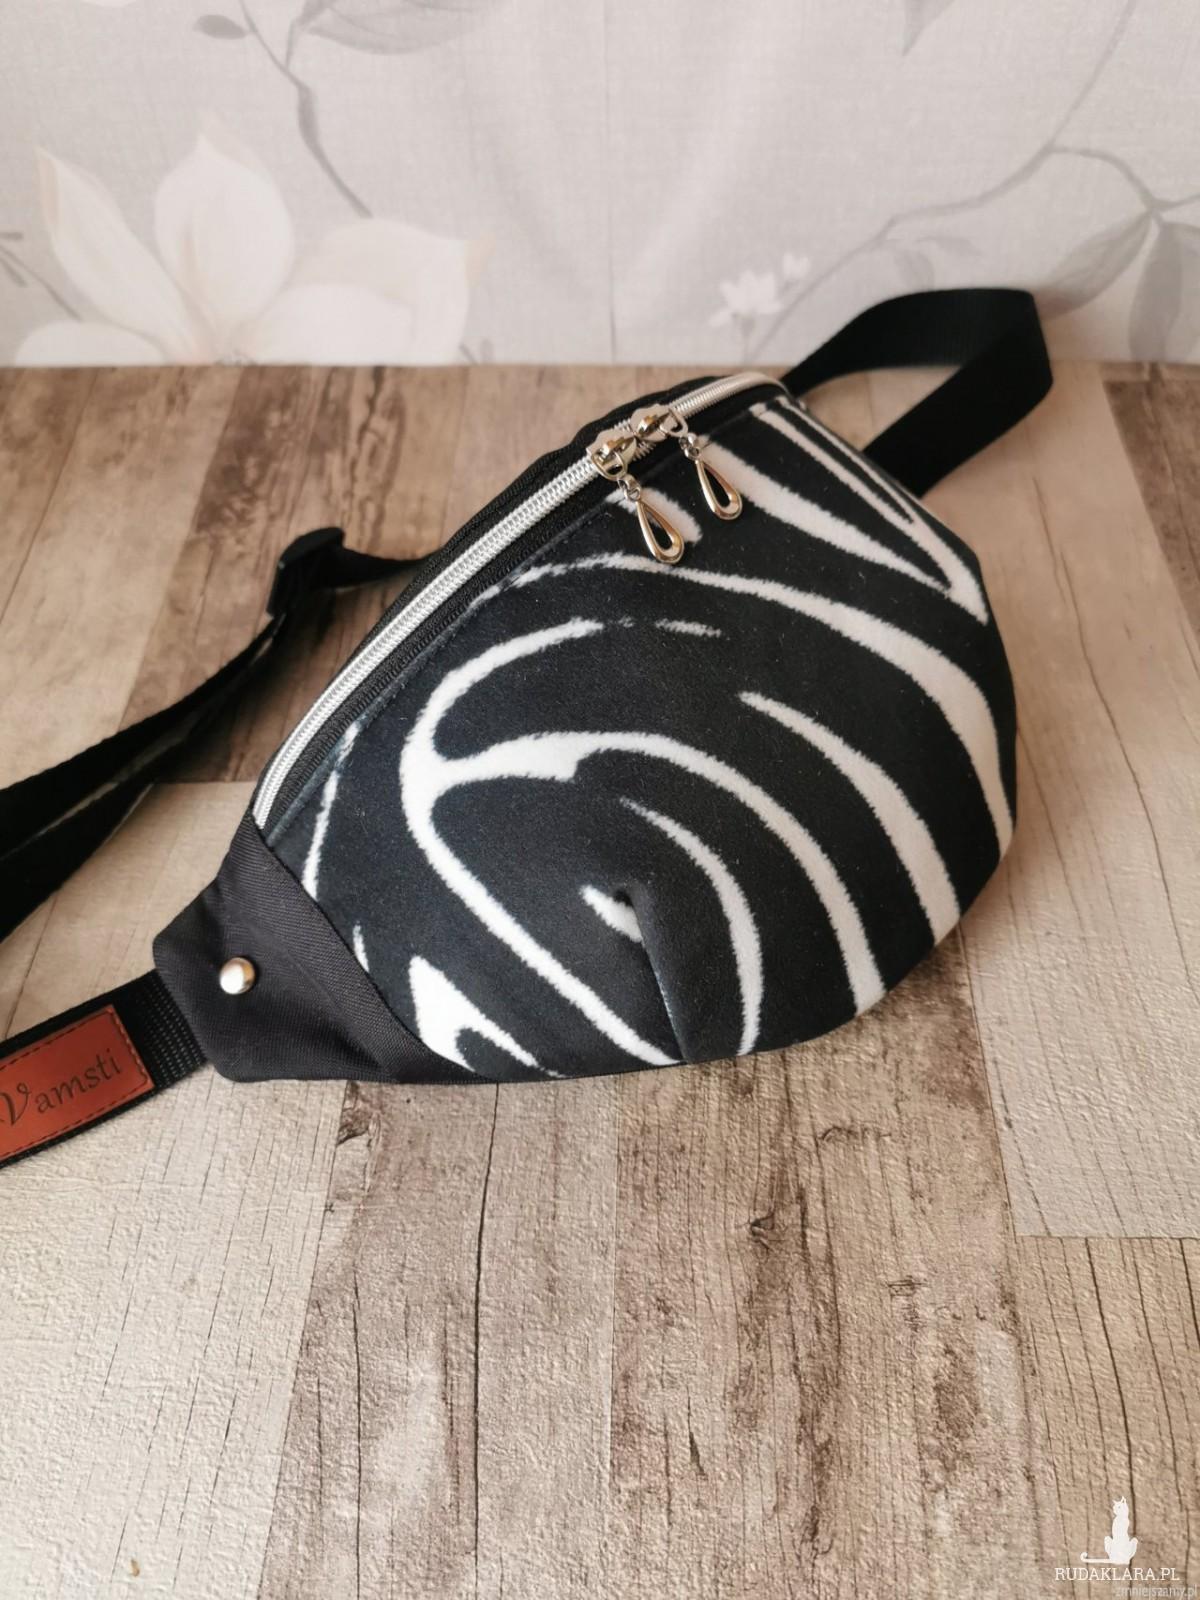 Nerka saszetka biodrowa wodoodporna handmade torebka na pas torebka na ramię zebra